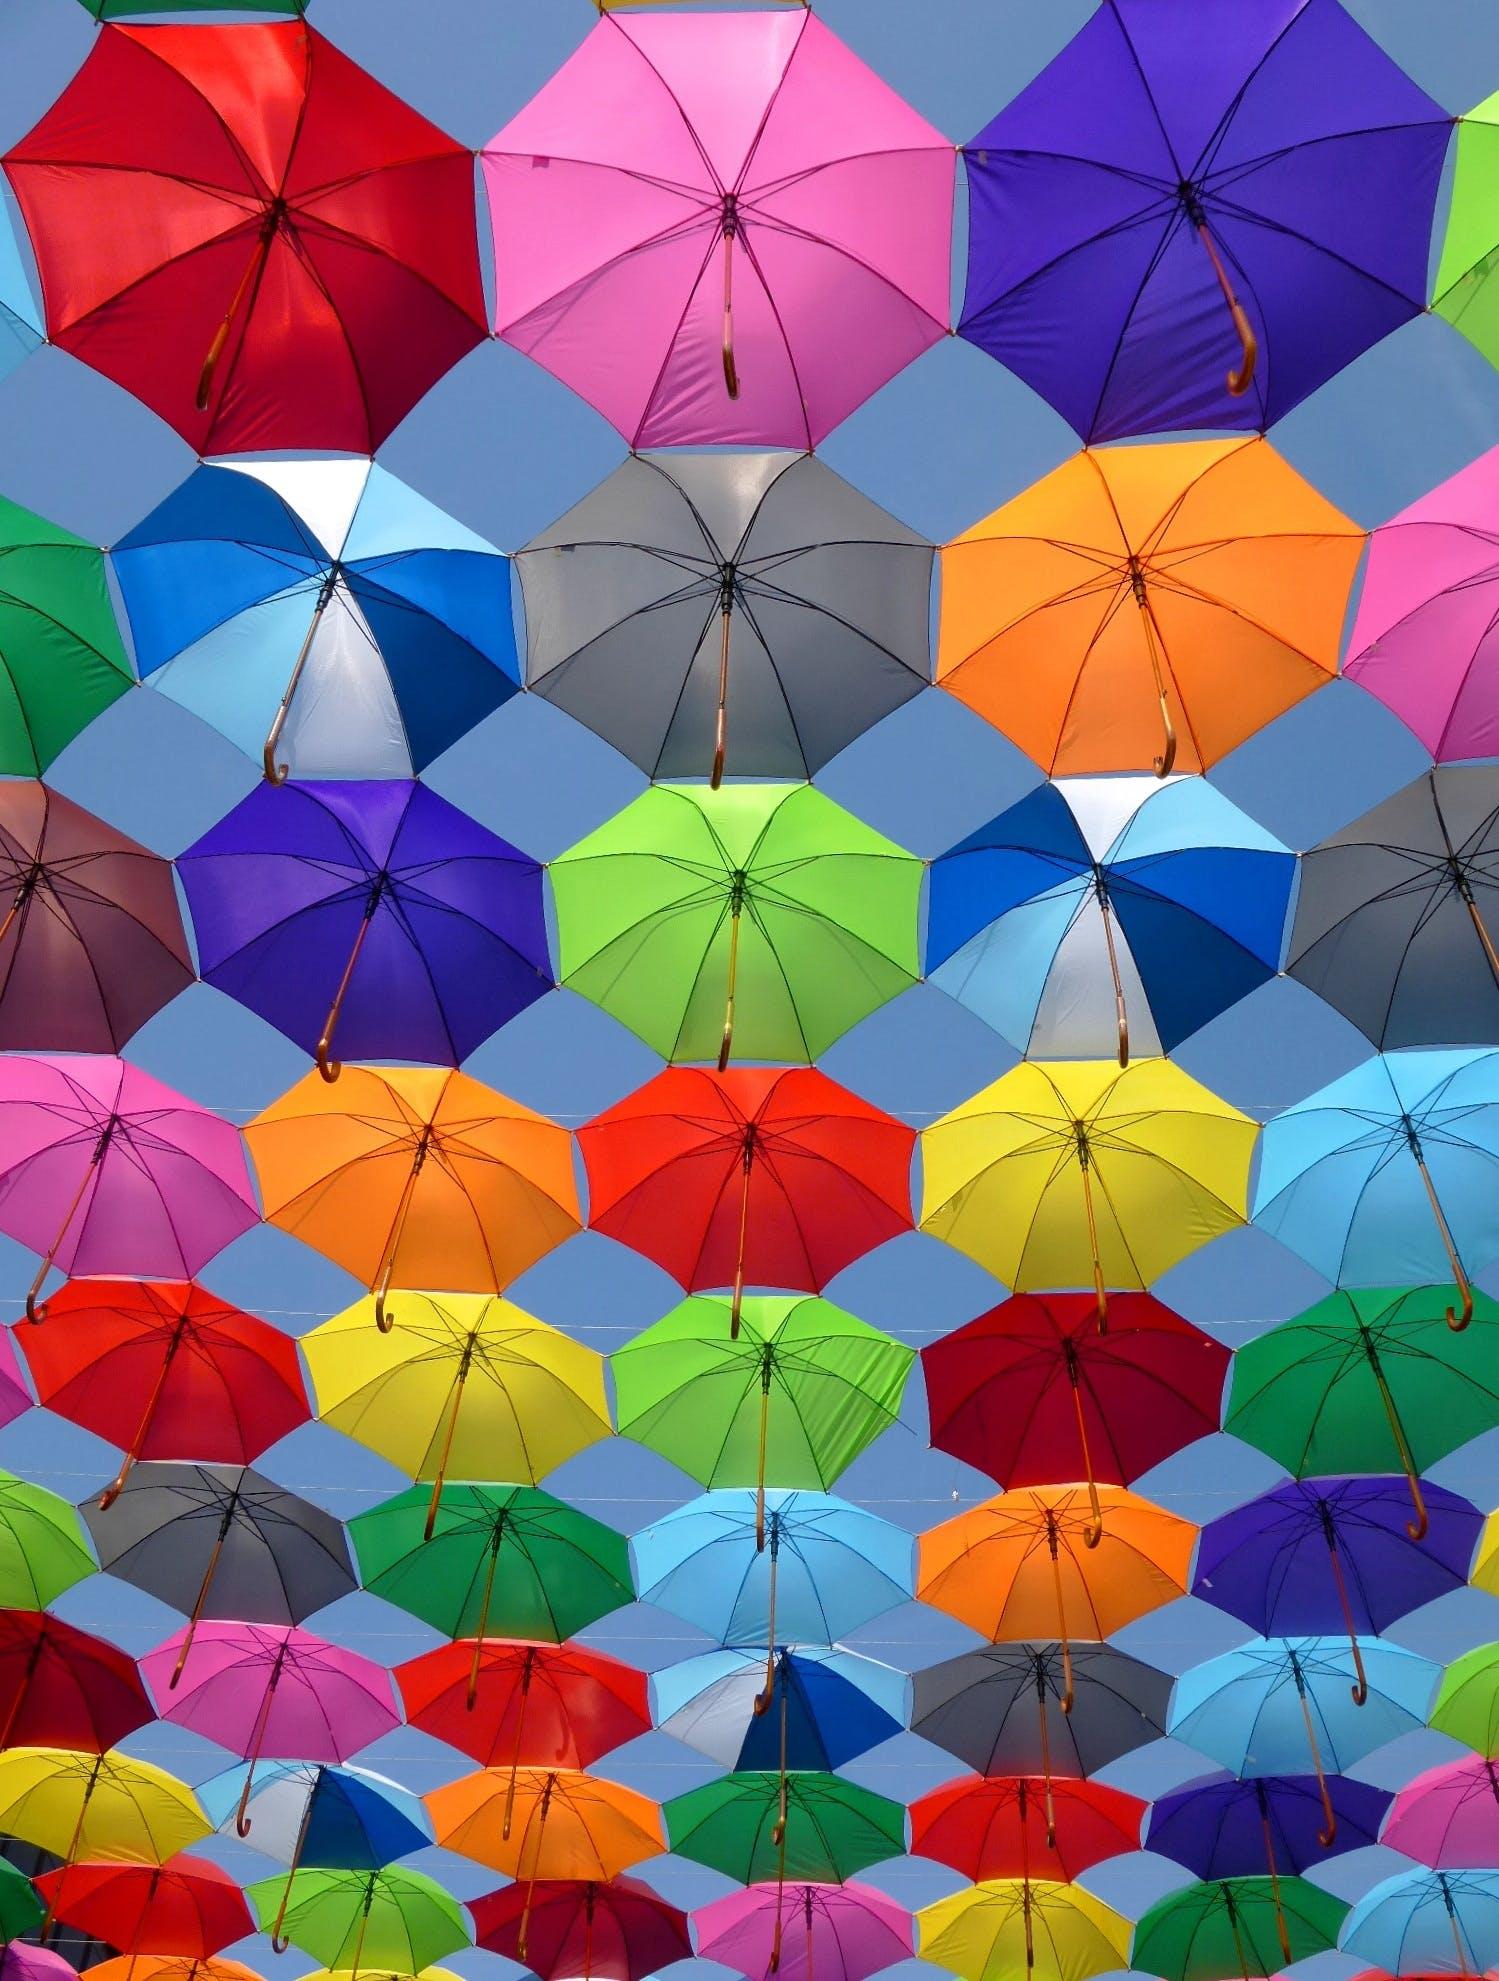 Pink Grey and Green Folding Umbrella Painting